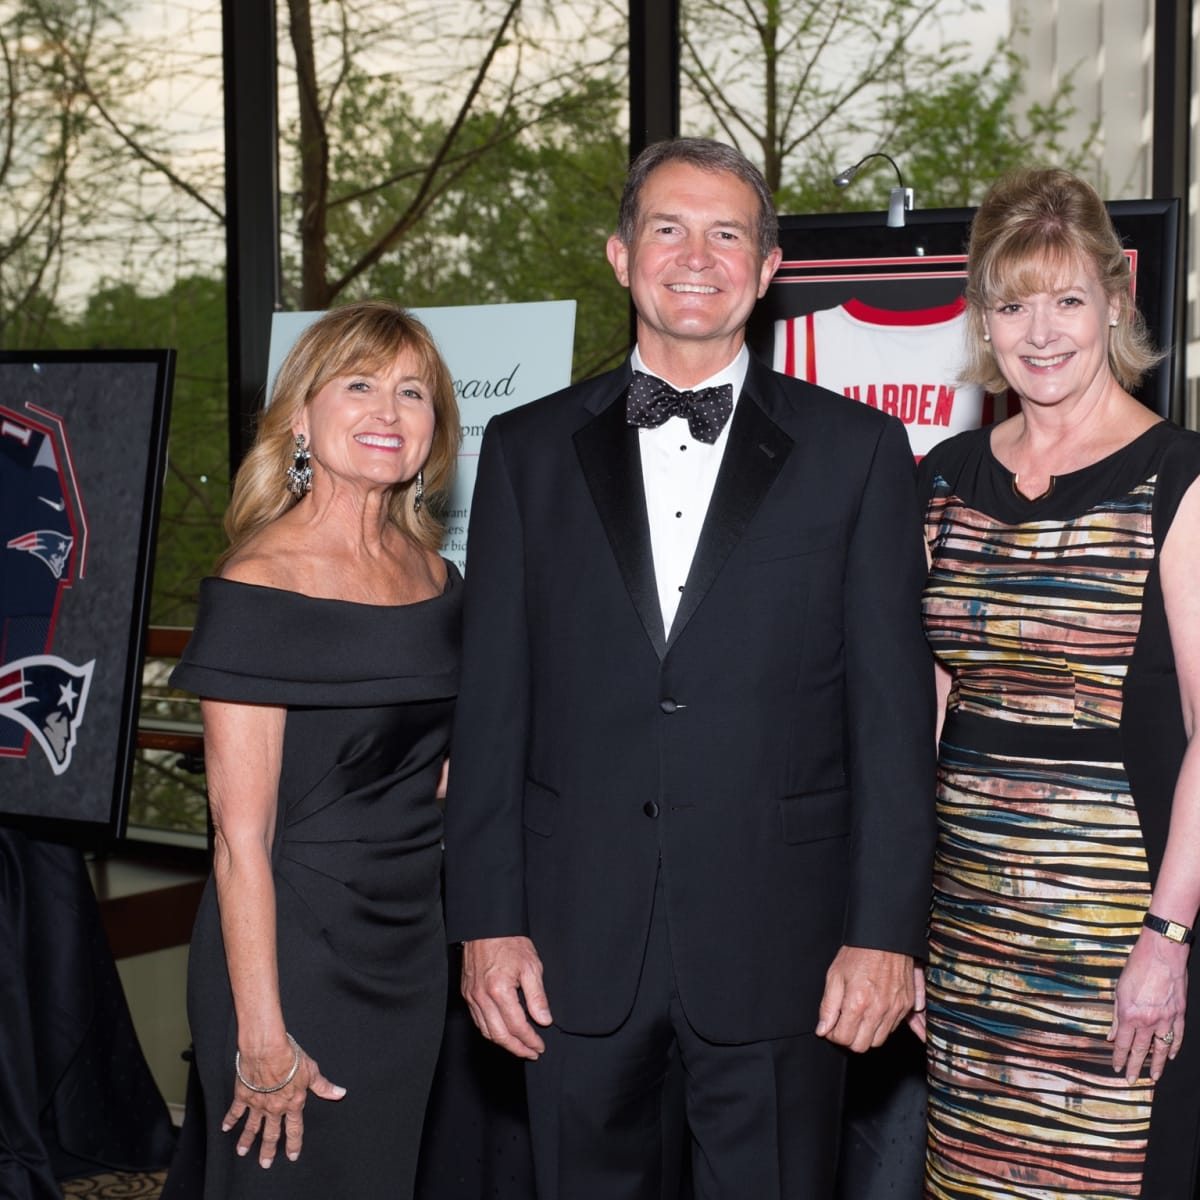 Marlene & Kurt Nondorf, Leslie Bourne at Covenant House Gala 2017